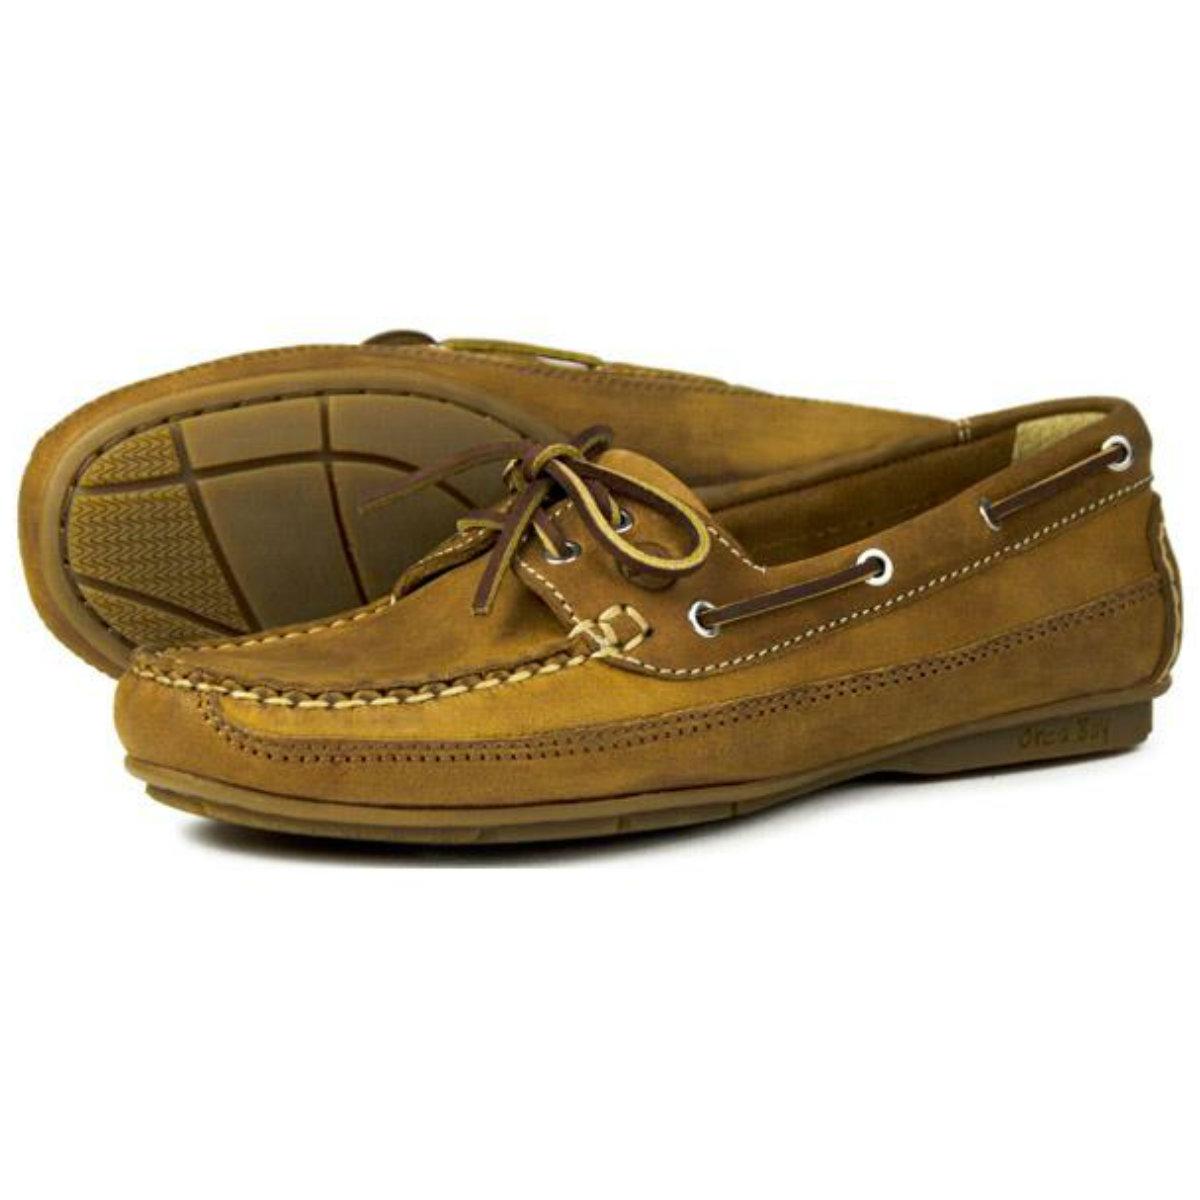 8ec97e6d925a1 Orca Bay Ladies Deck Shoes – Bahamas (Sand) – Muddy-Footprints